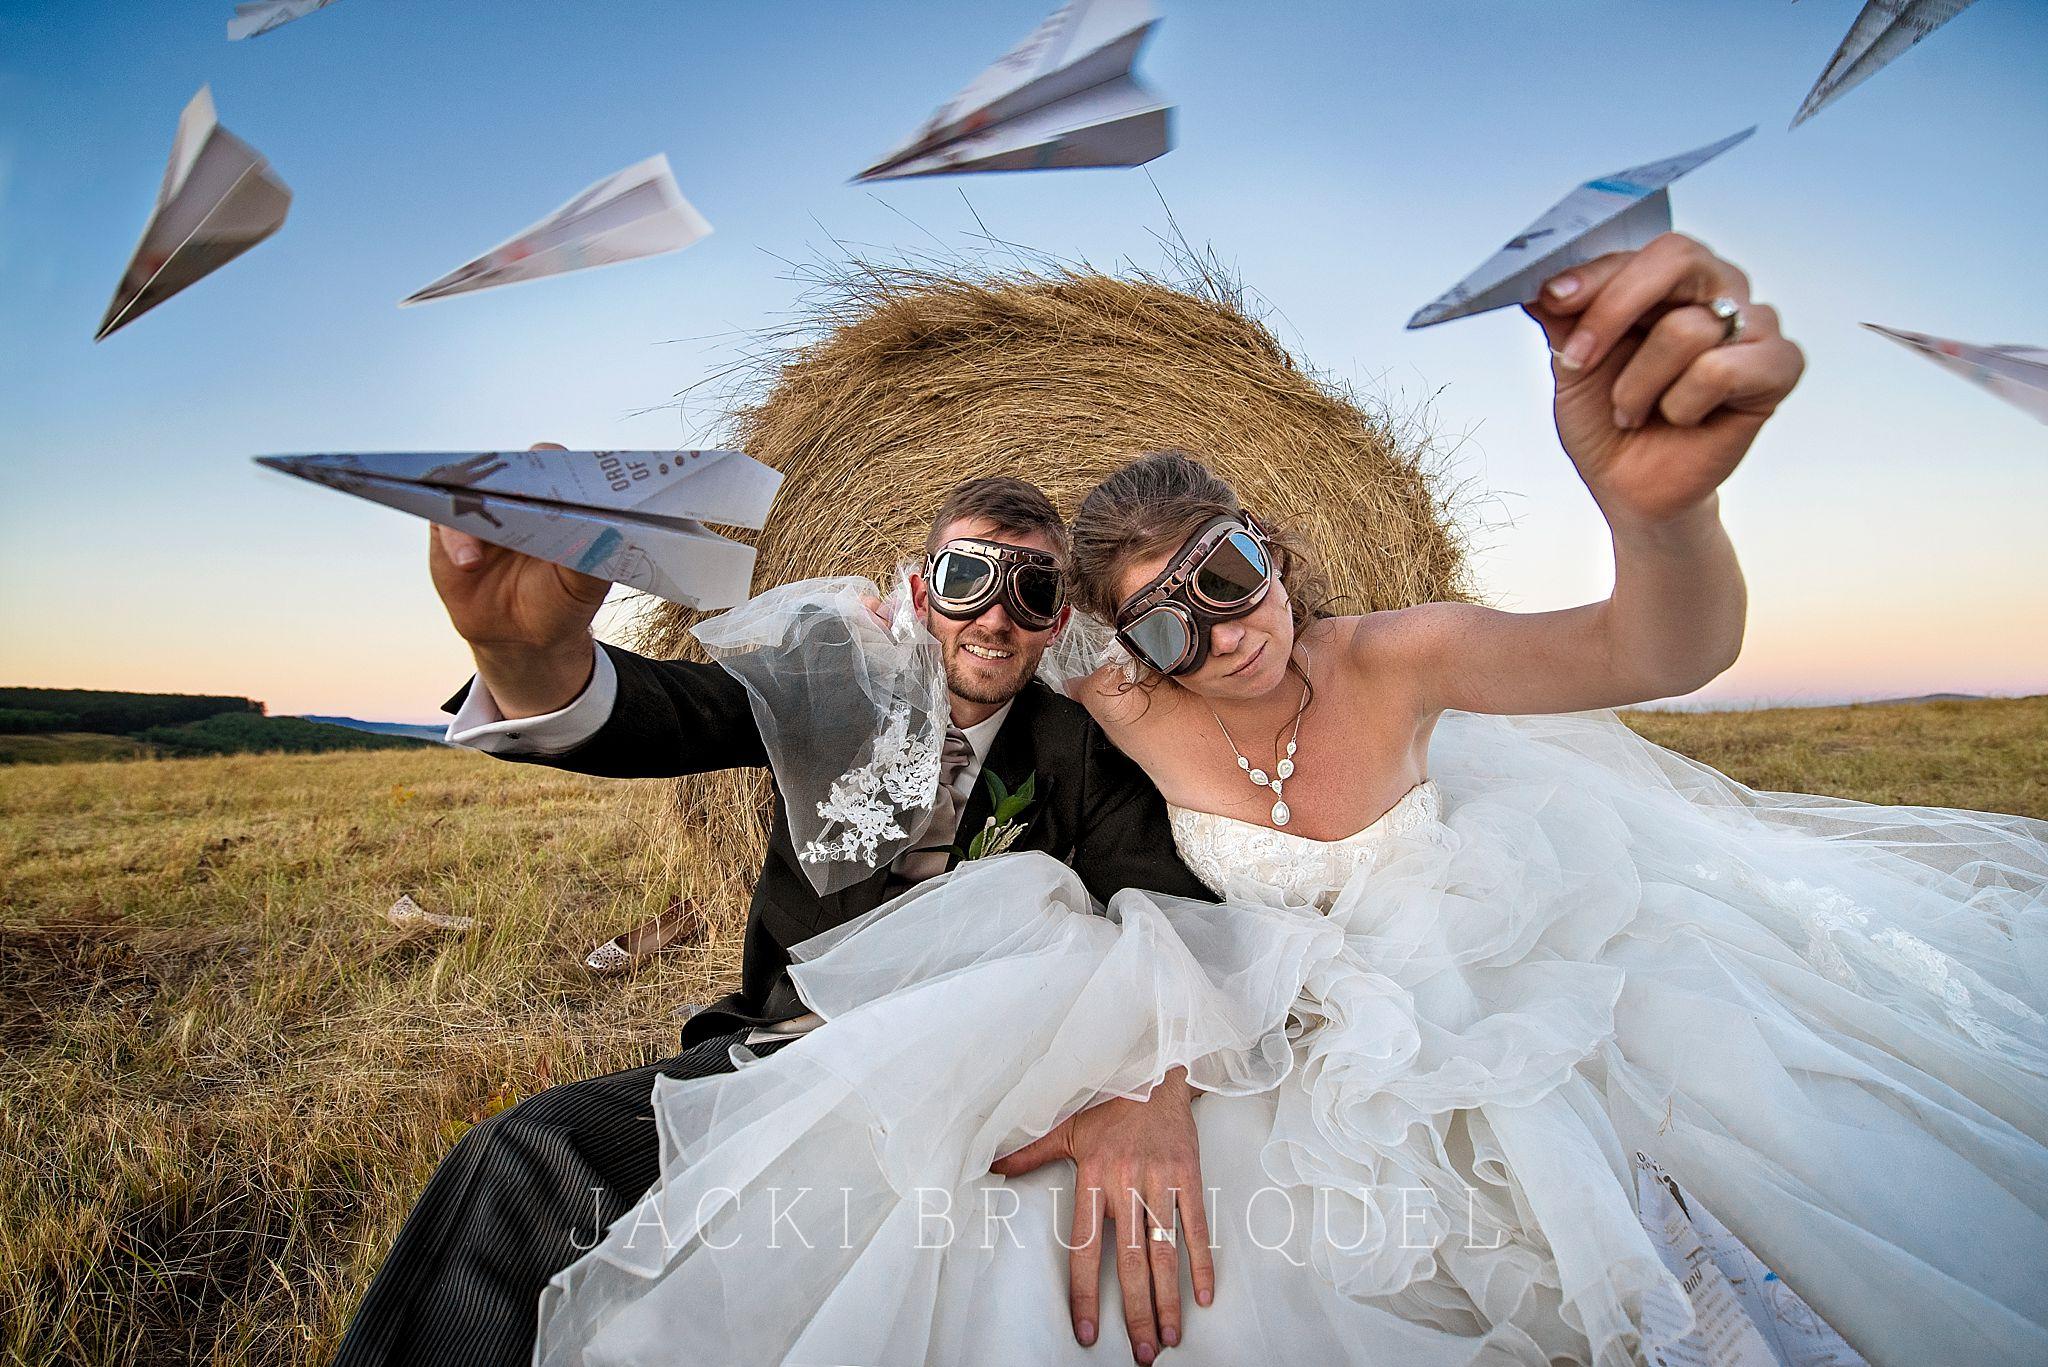 Jacki-Bruniquel-Worlds-Best-Wedding-Photos-Portraits-15